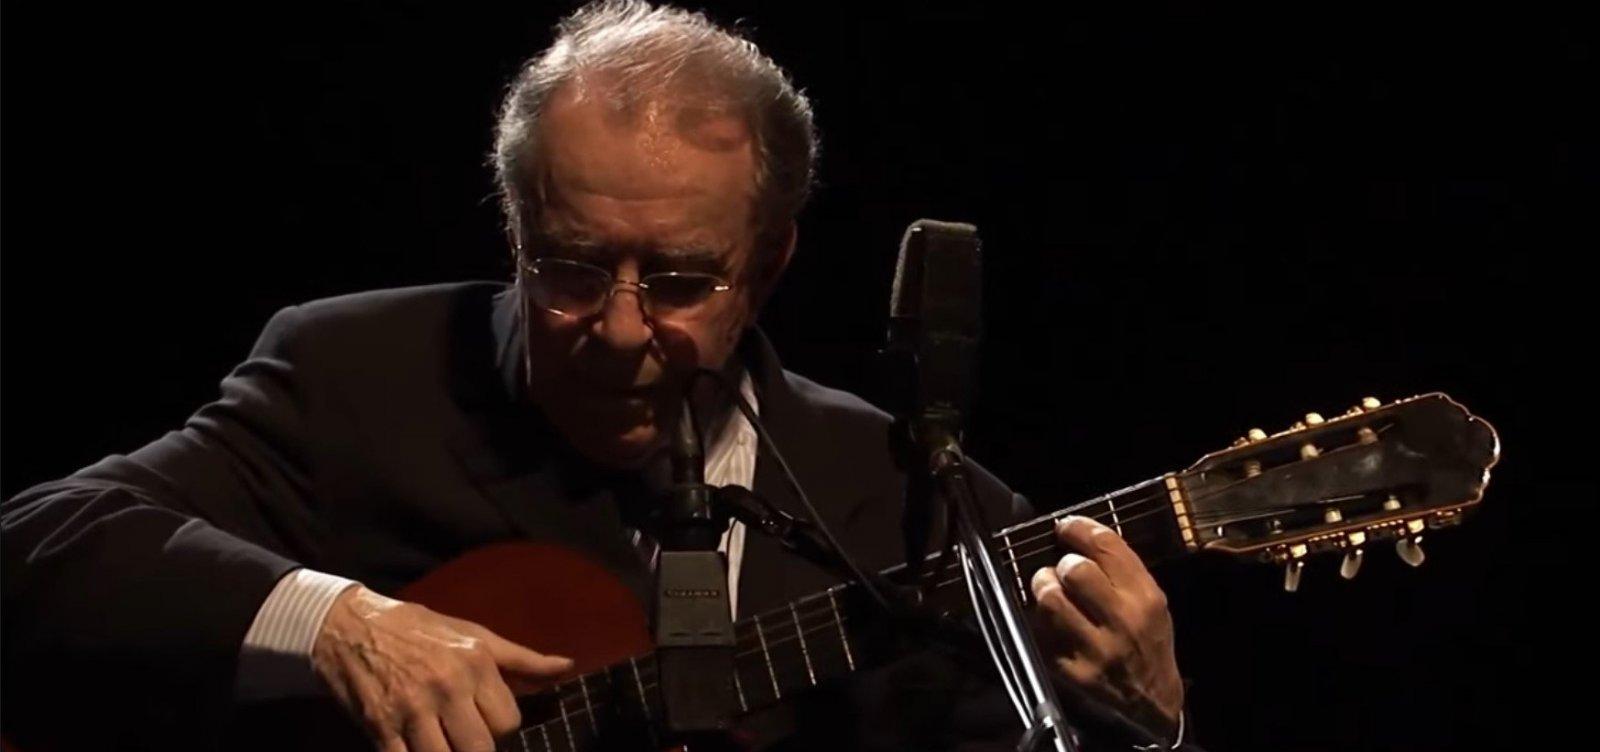 João Gilberto ganha canal Vevo no YouTube